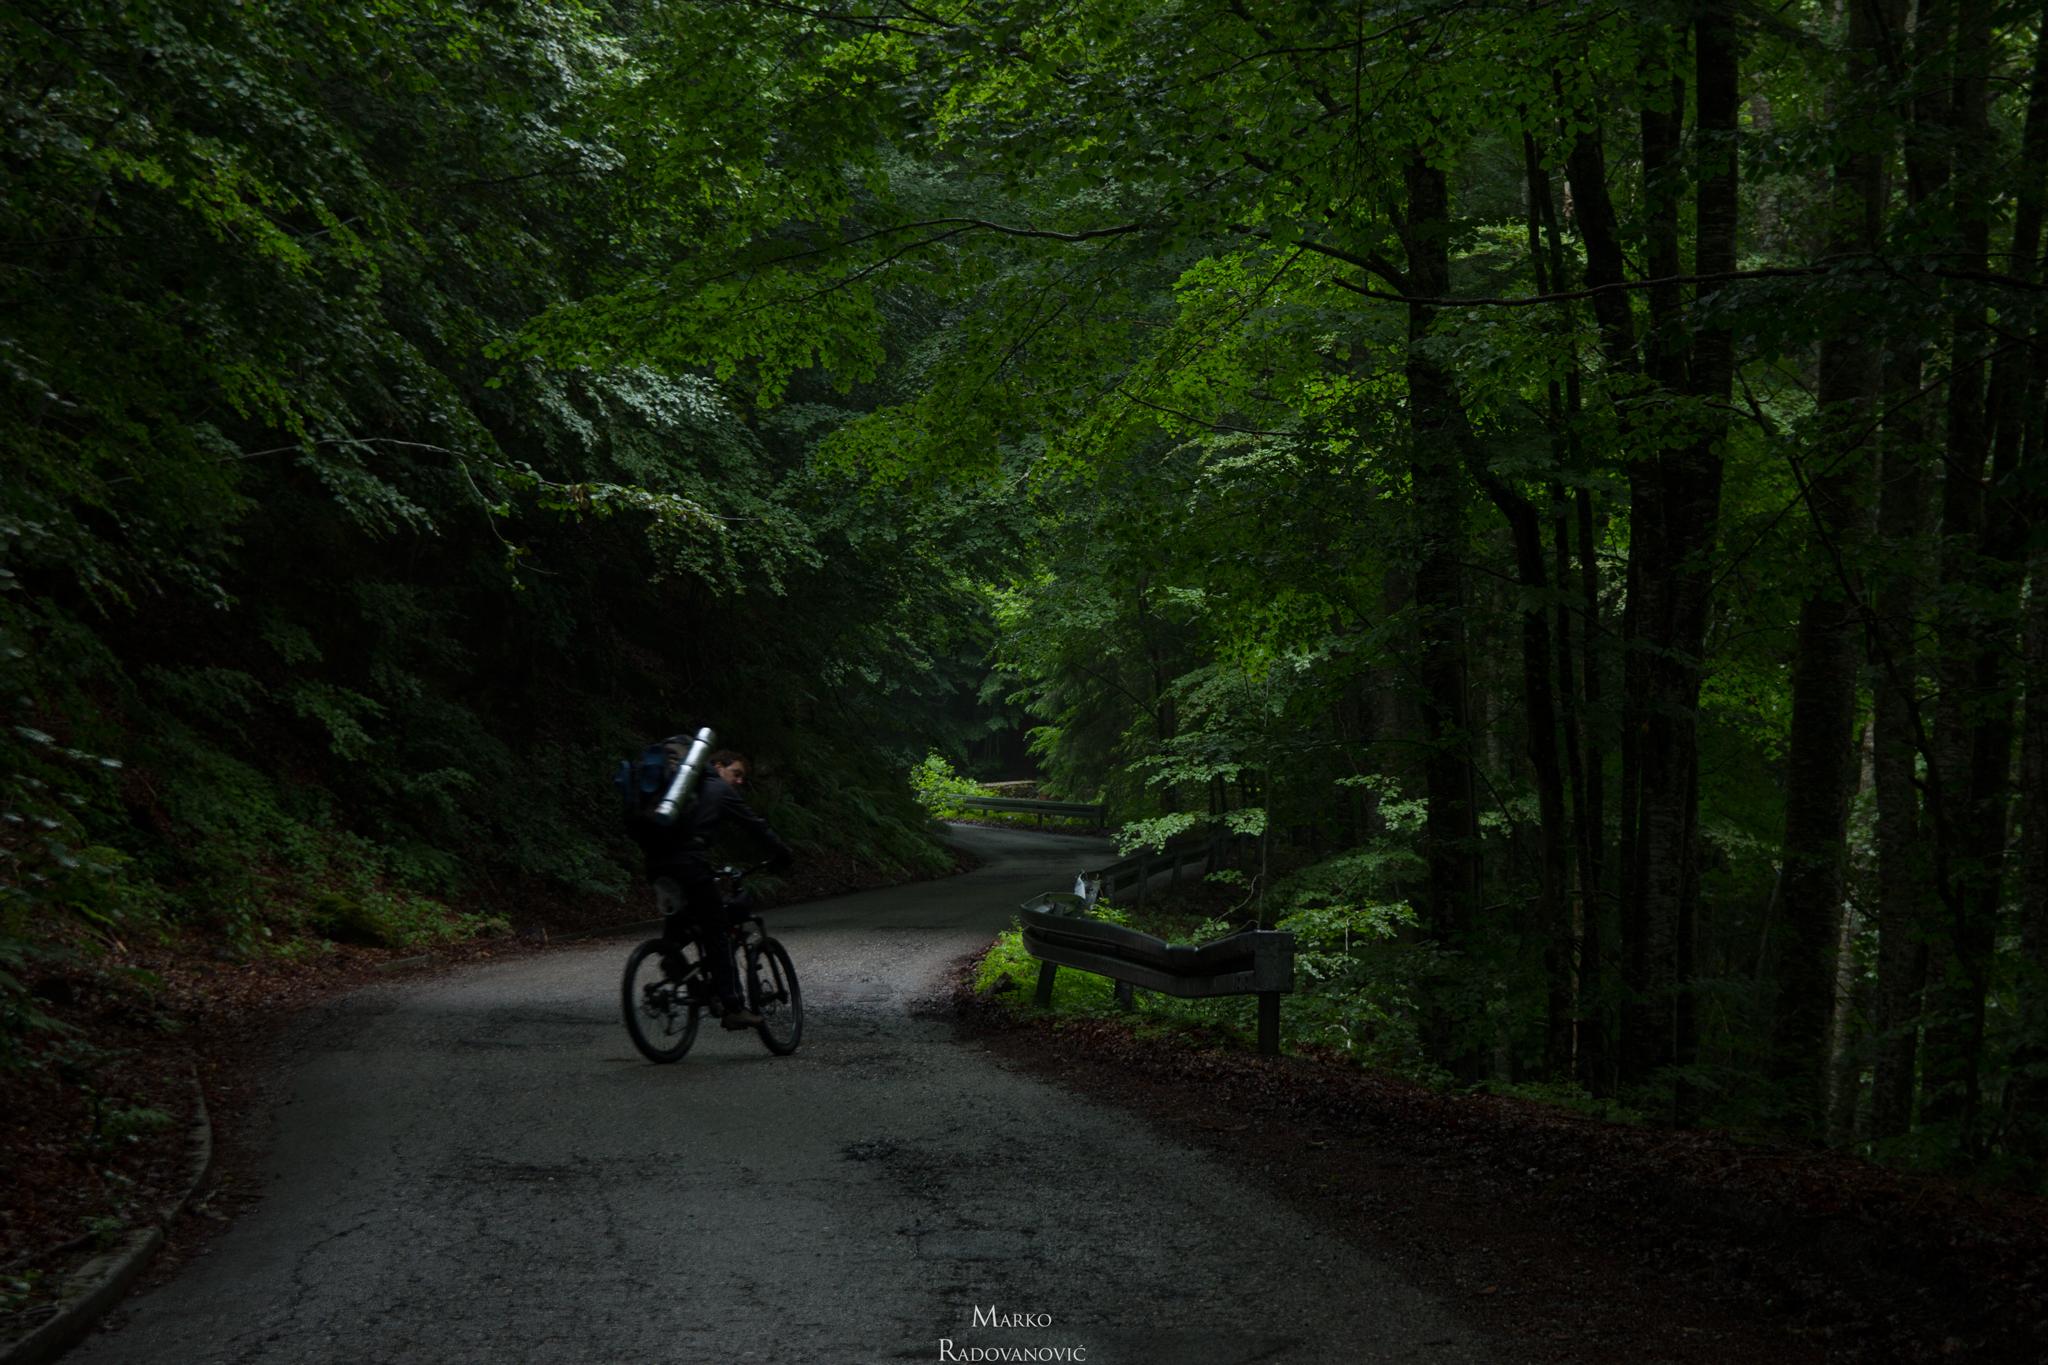 06-Iz Bara kraljskih do Trešnjevika kroz predivnu bukovu šumu